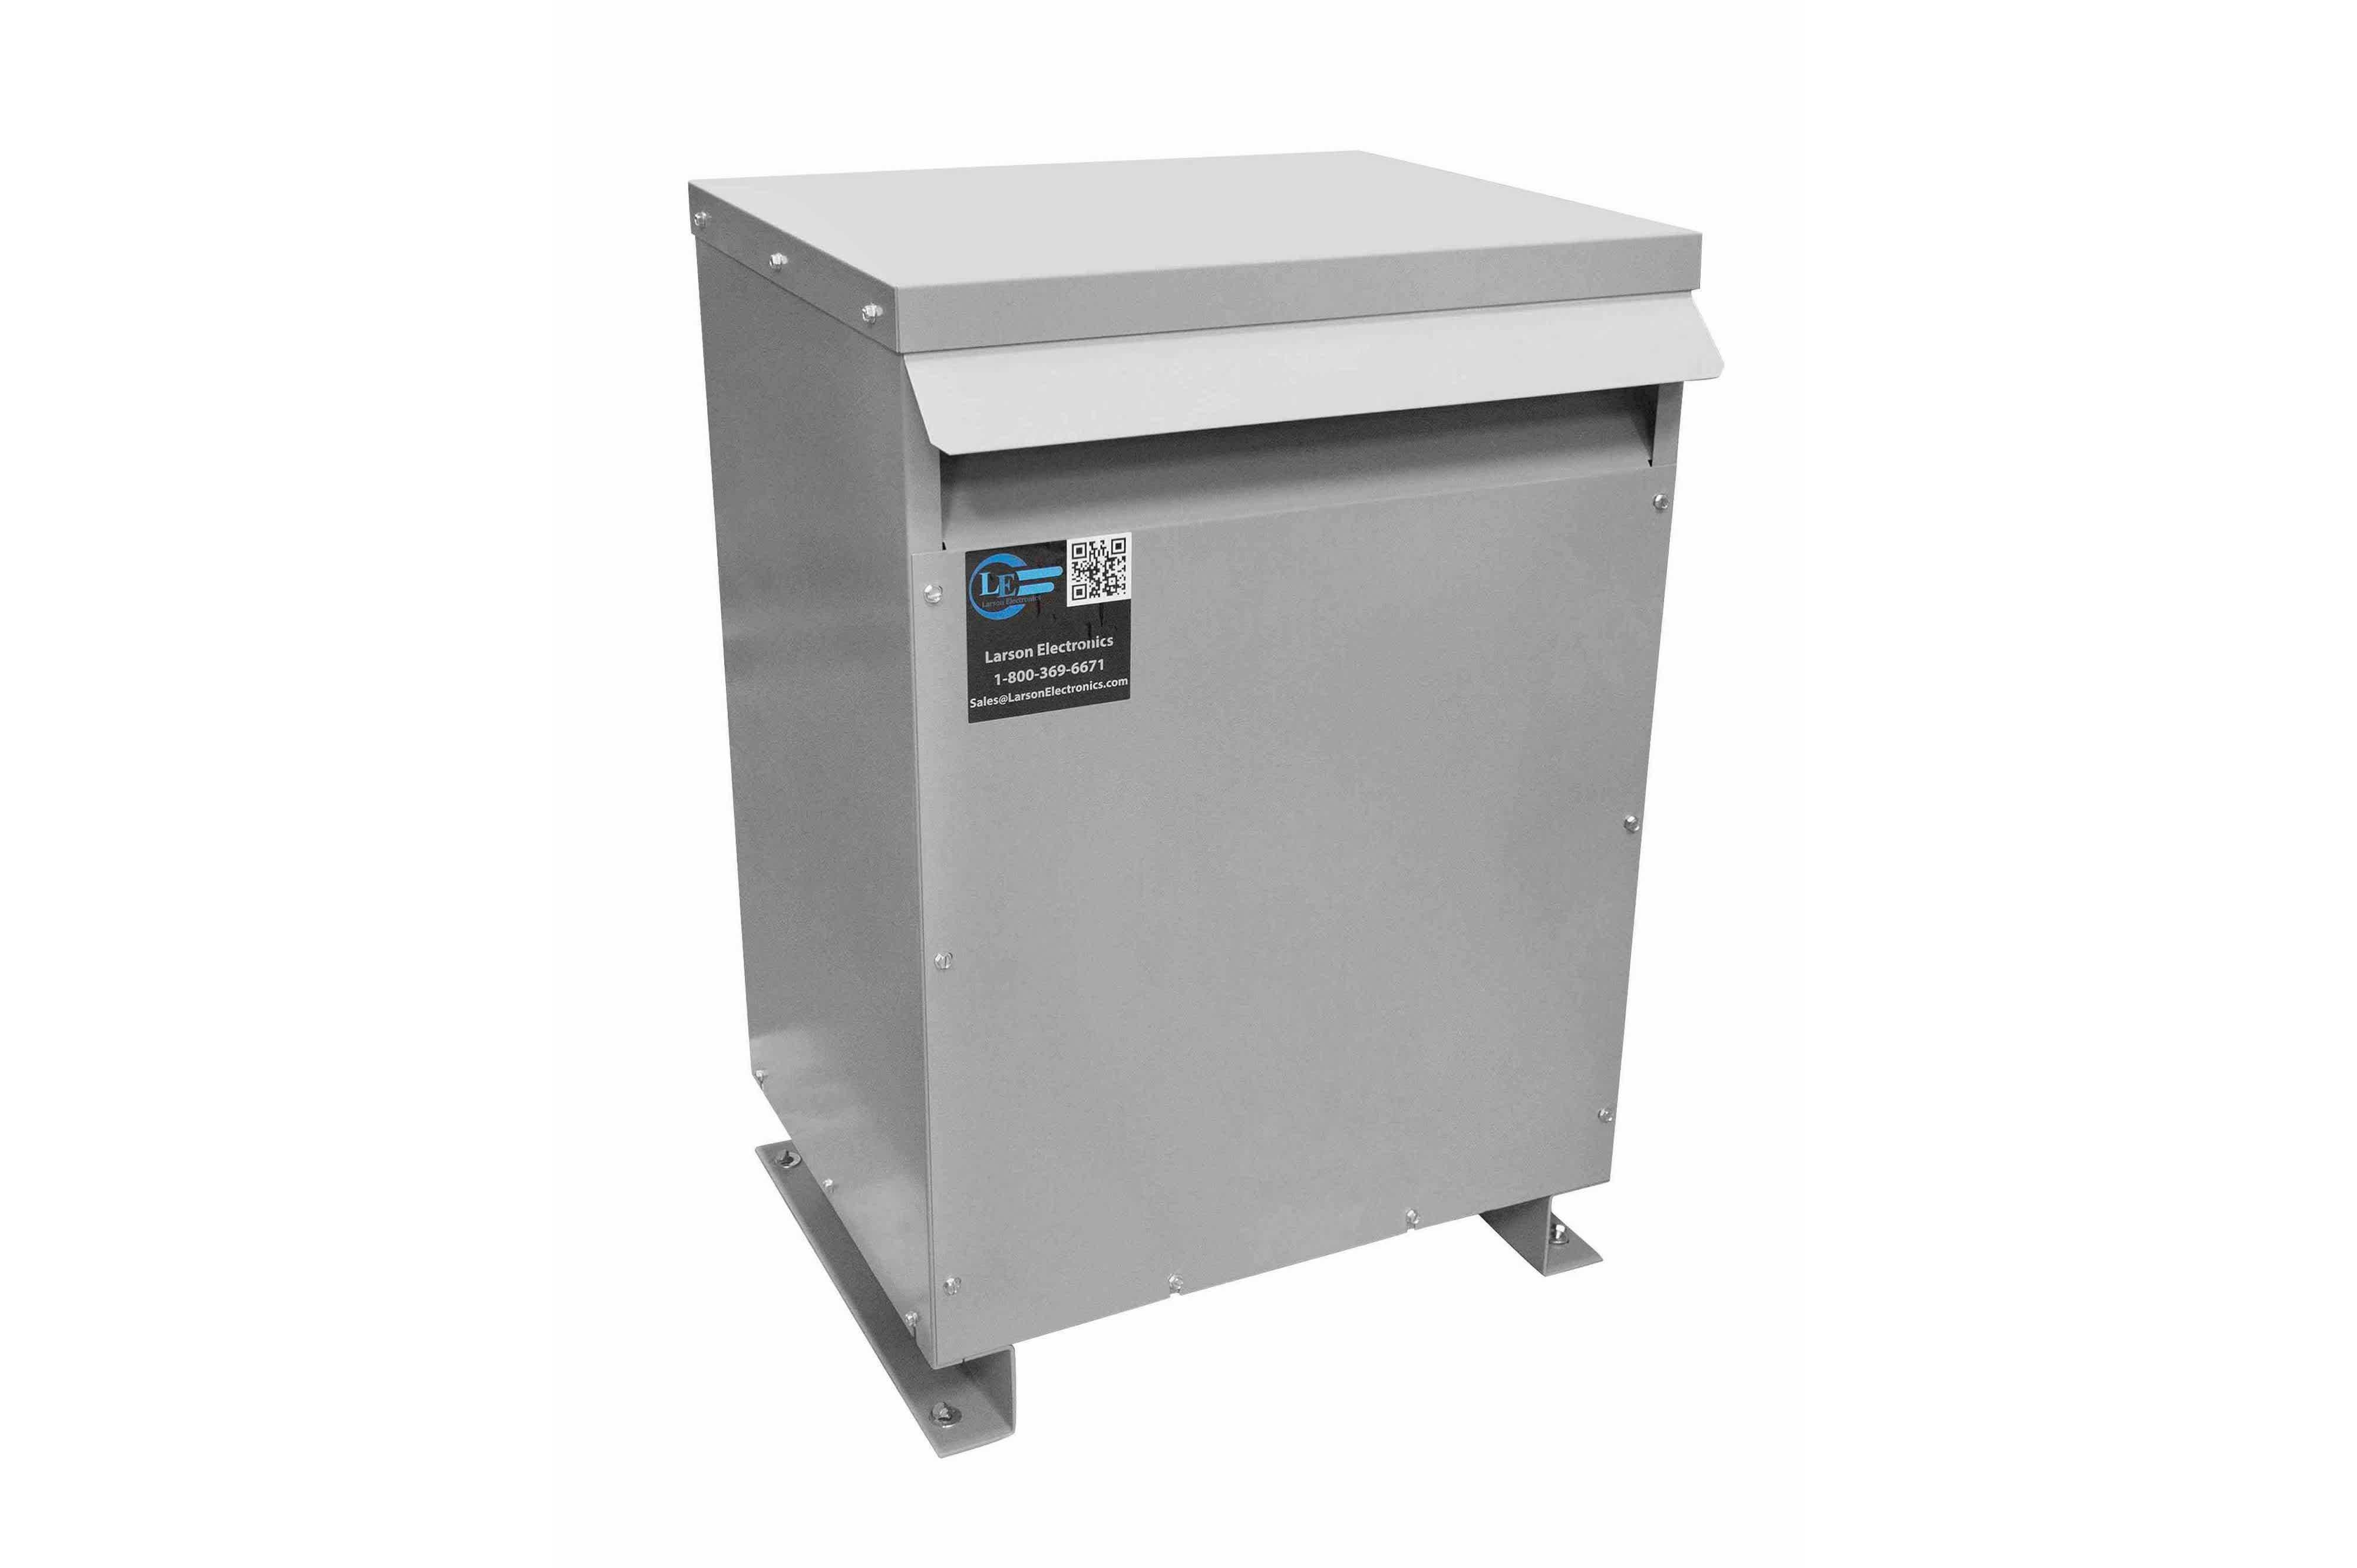 25 kVA 3PH Isolation Transformer, 220V Wye Primary, 480V Delta Secondary, N3R, Ventilated, 60 Hz